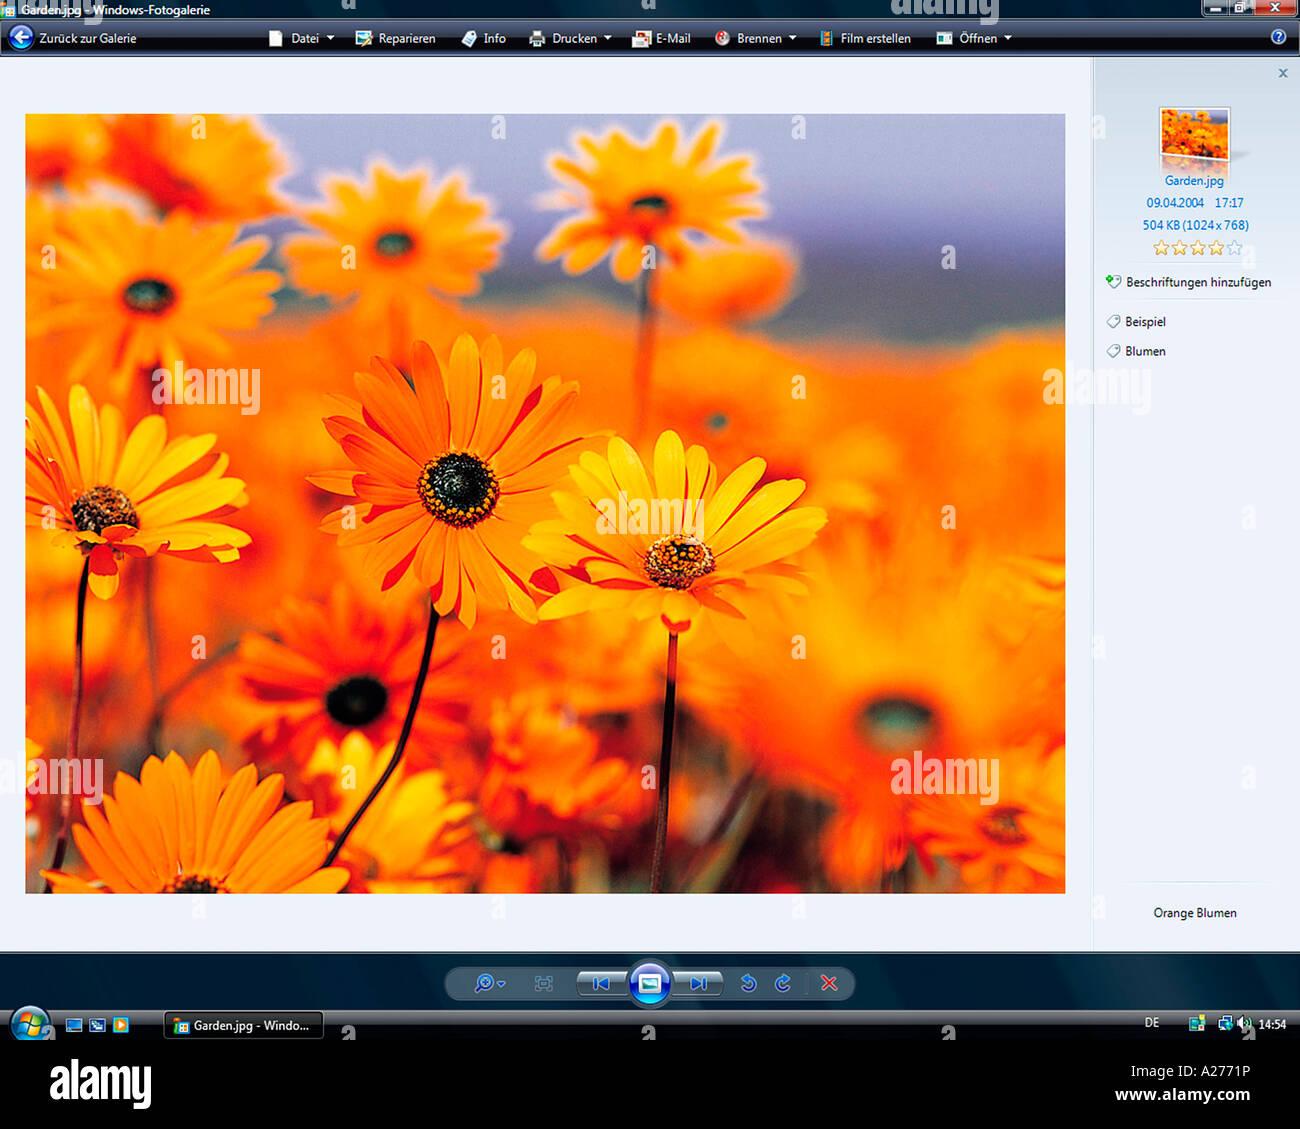 Microsoft Windows Vista, german version, Windows Photo Gallery Application, screenshot - Stock Image